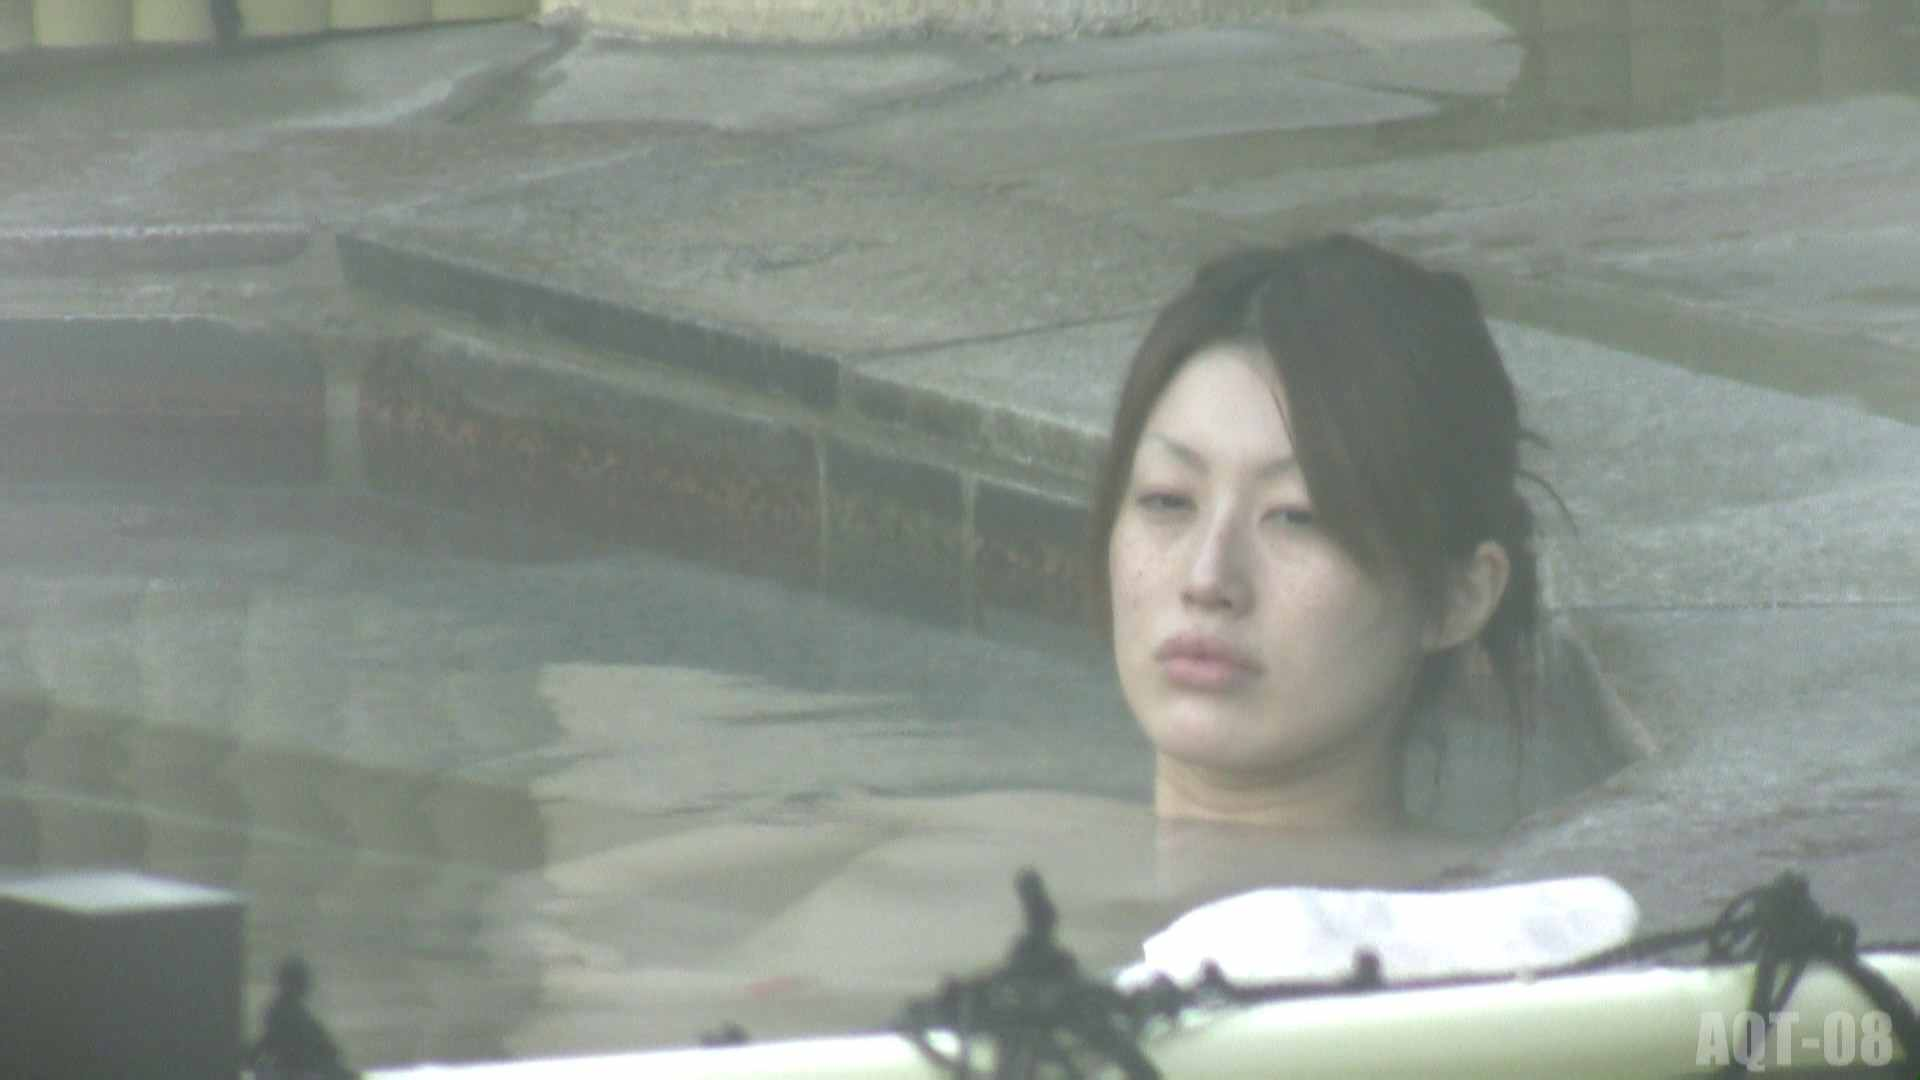 Aquaな露天風呂Vol.775 露天風呂編 | 盗撮シリーズ  78PIX 57